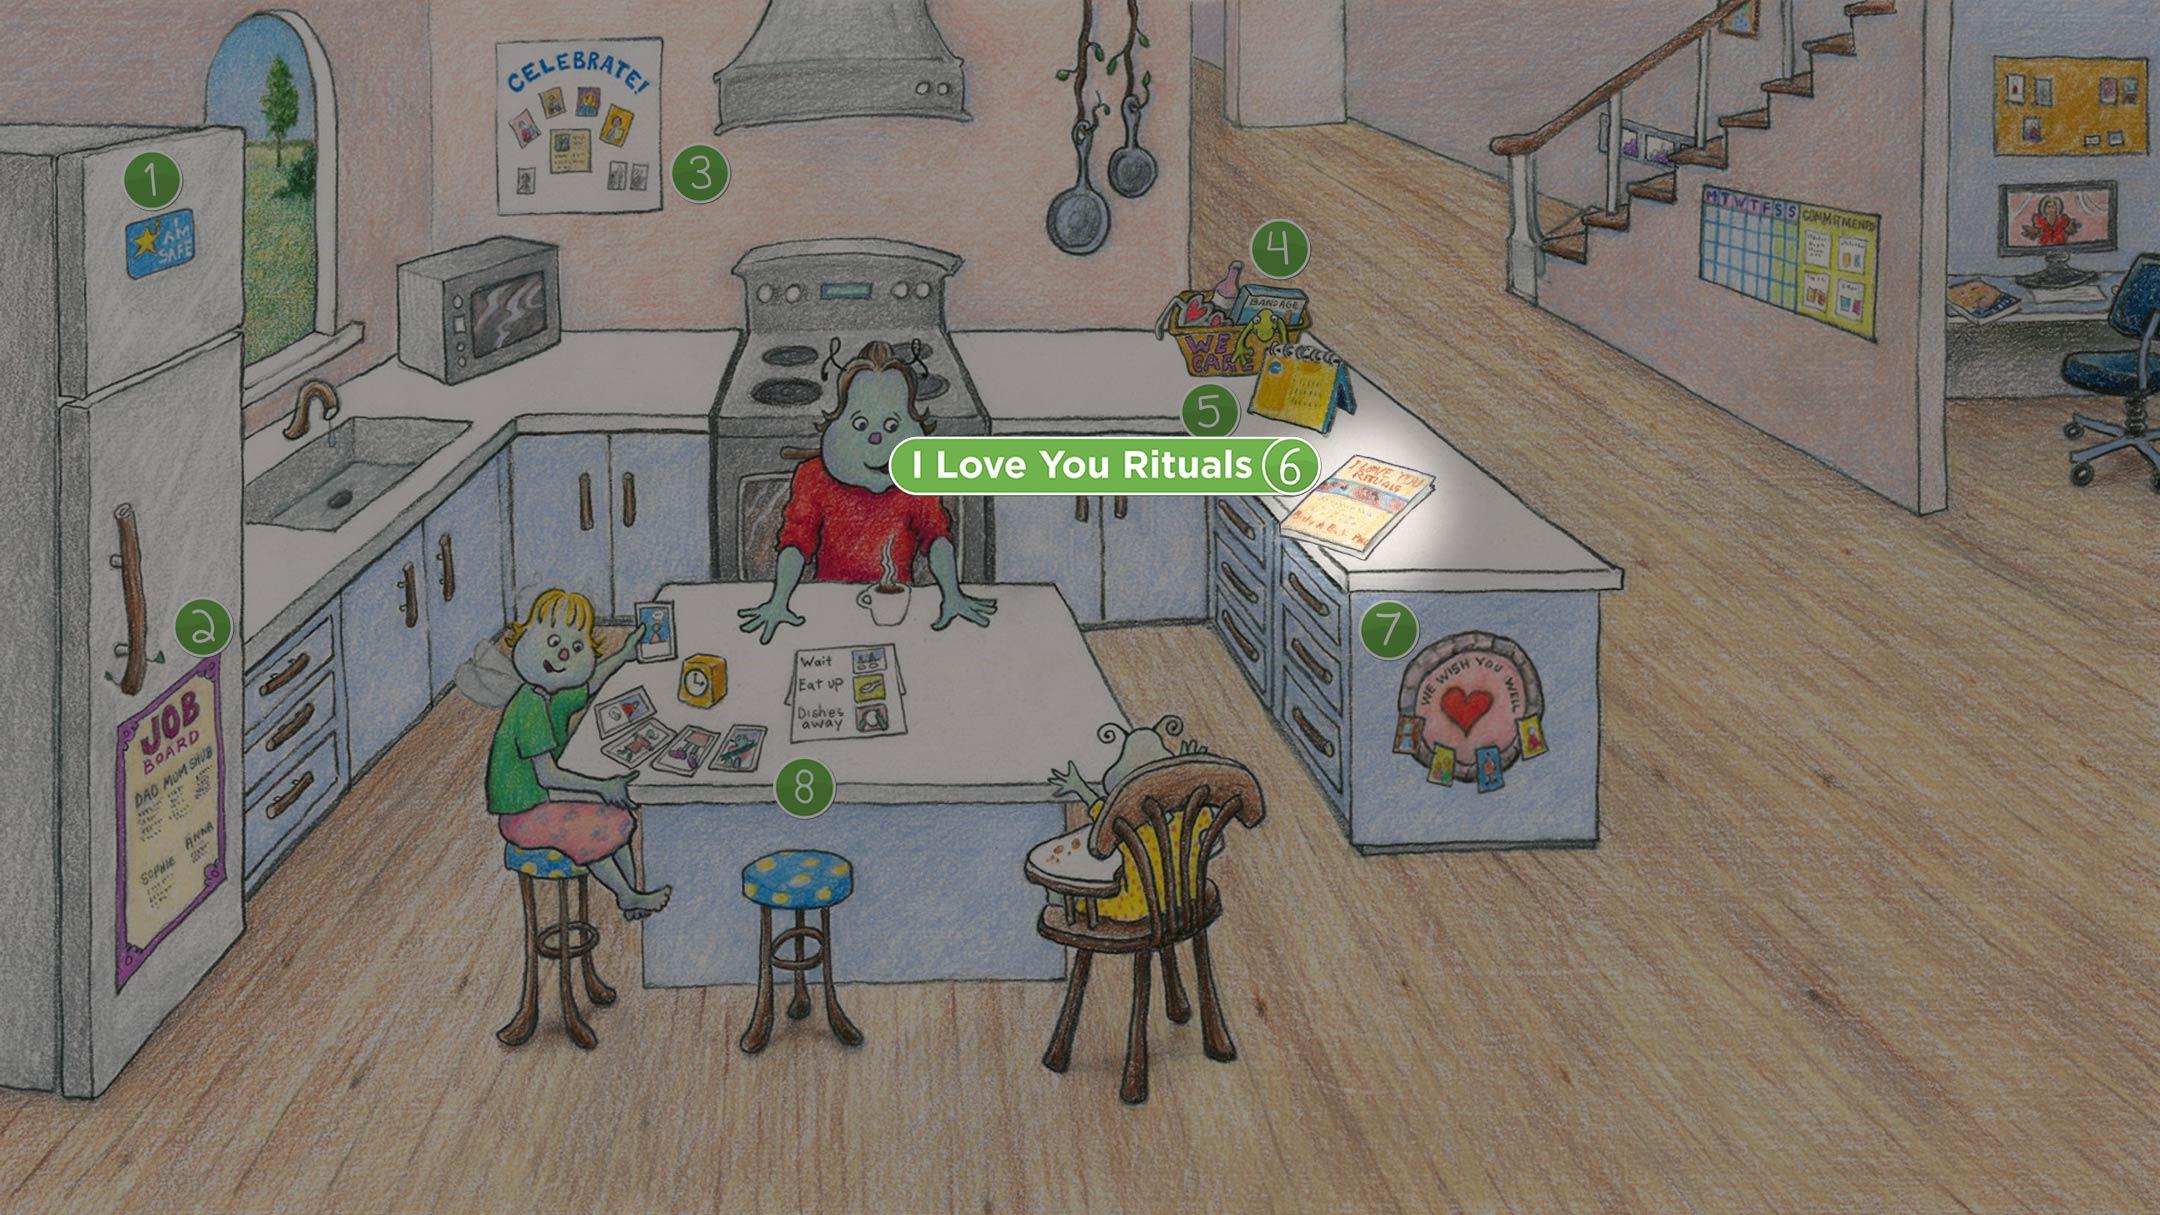 Kitchen: I Love You Rituals